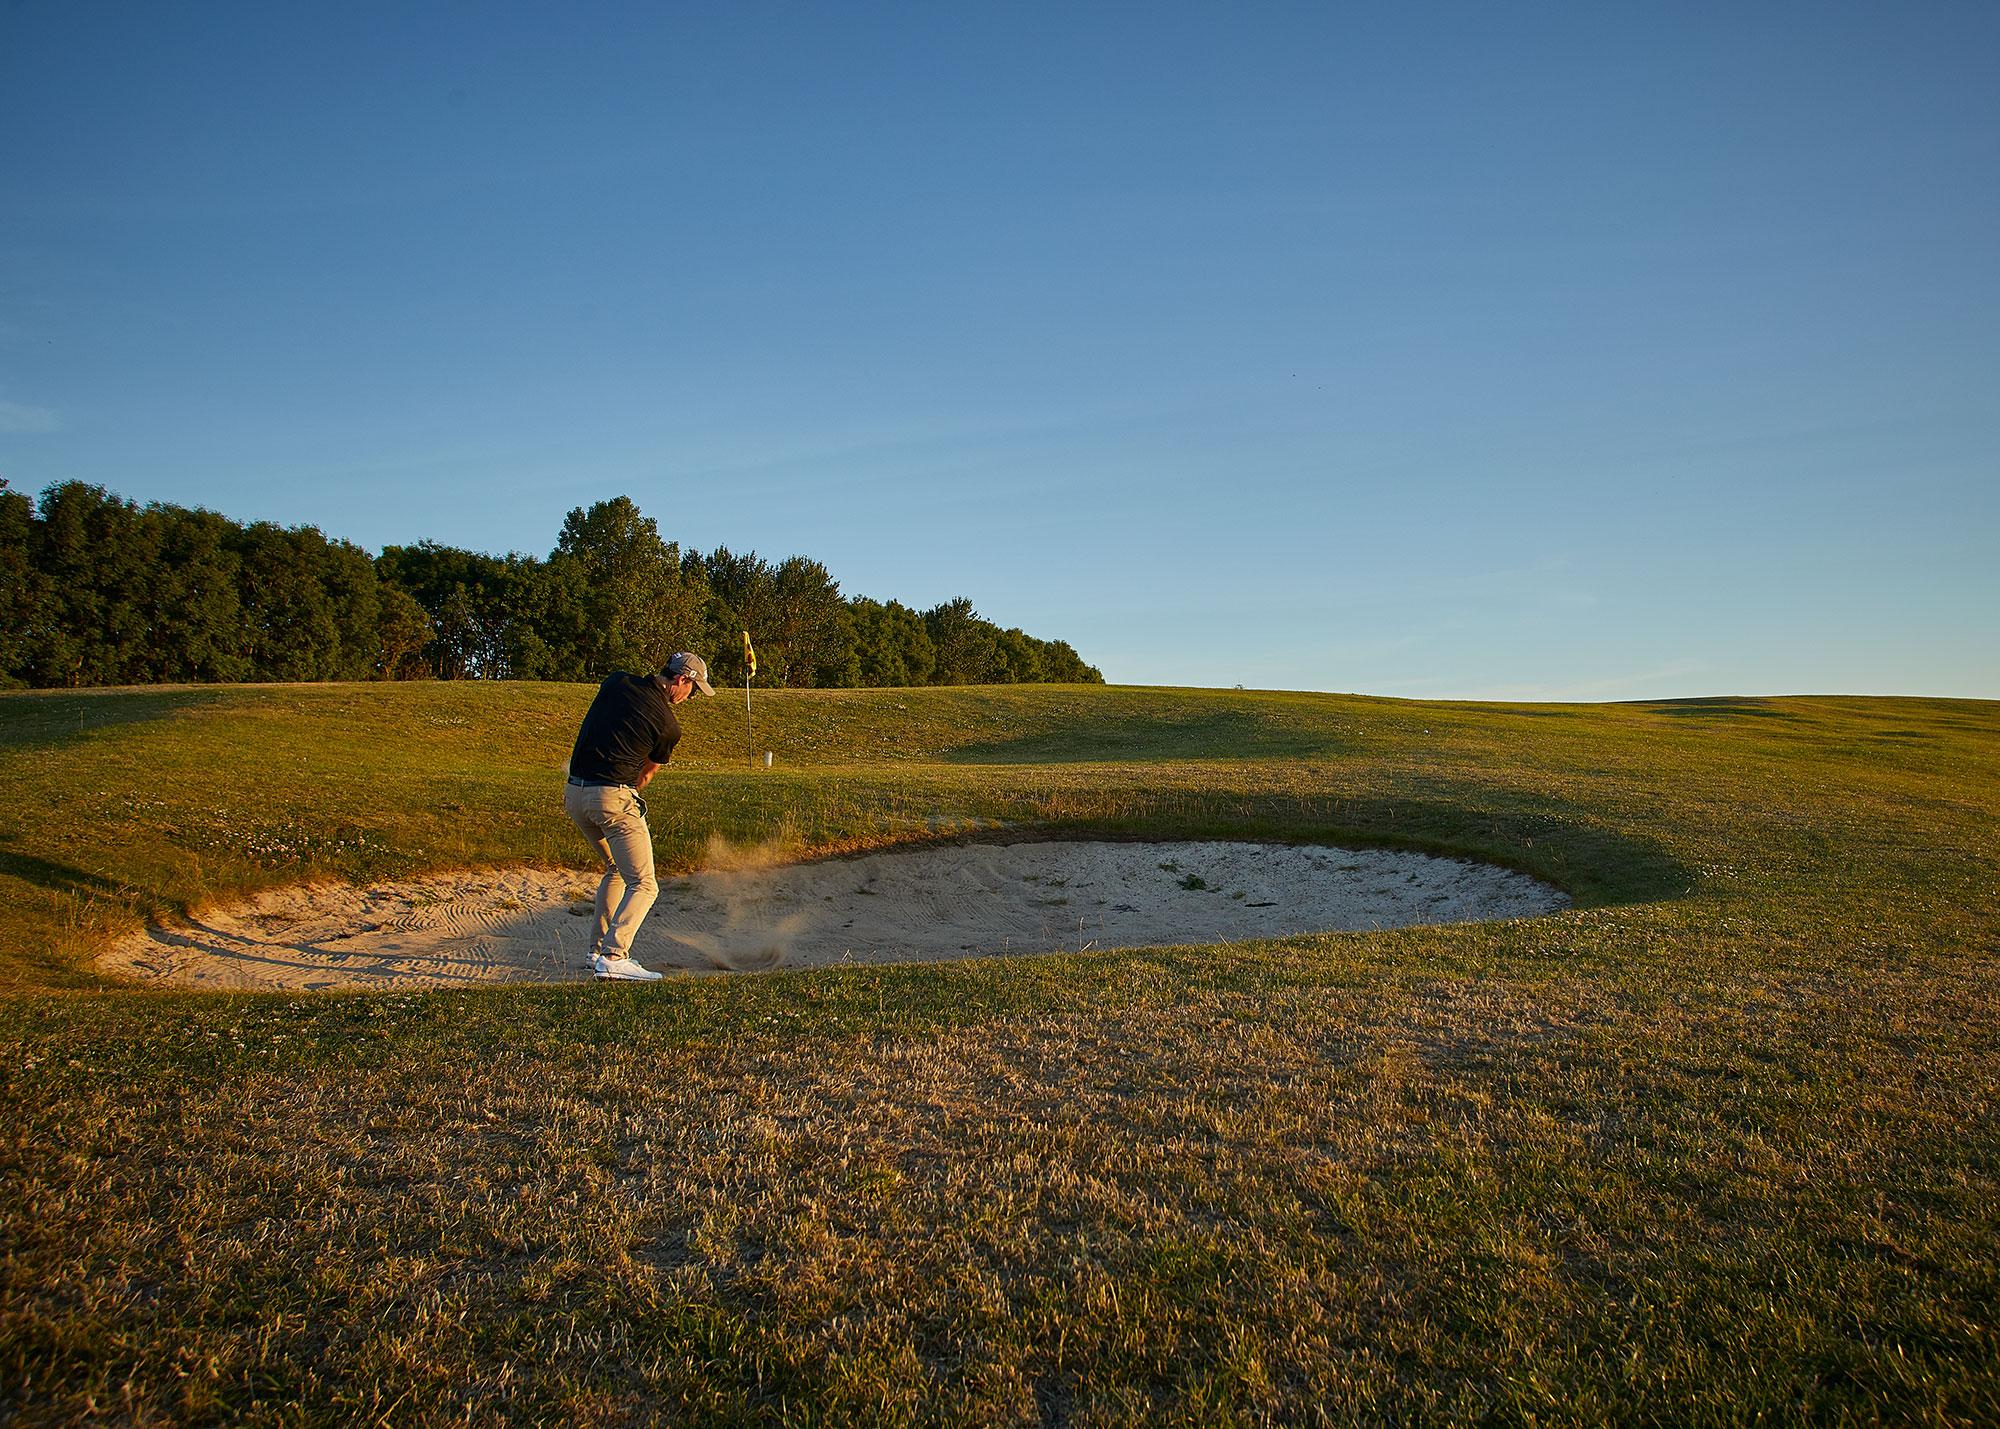 saltburn_golf_club_035-web.jpg